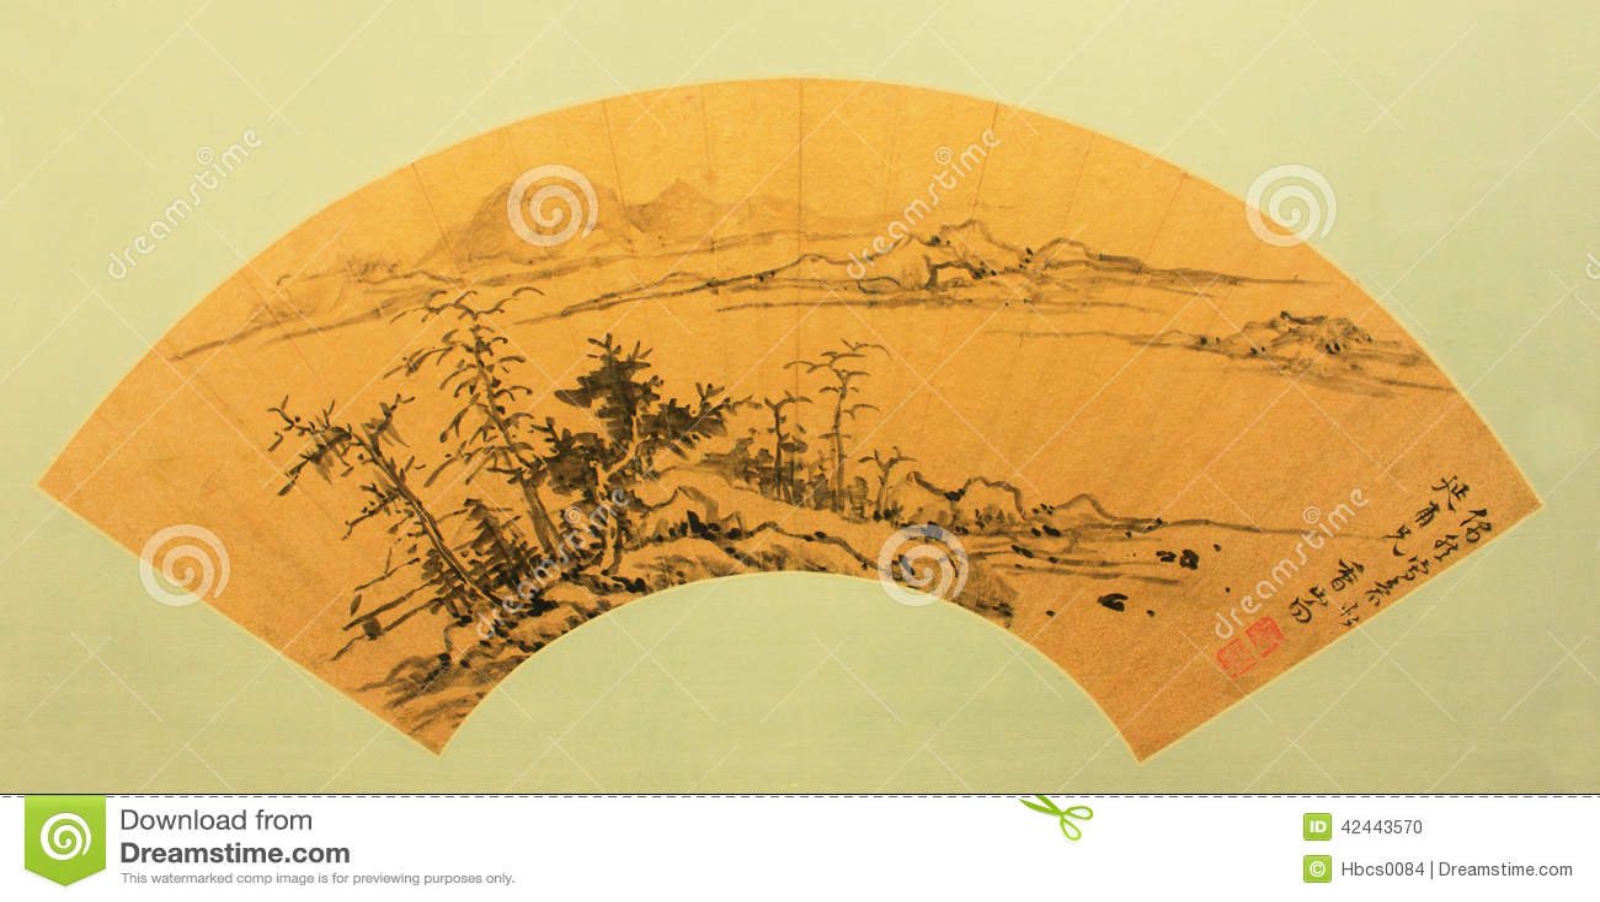 Ventilador plegable tradicional chino